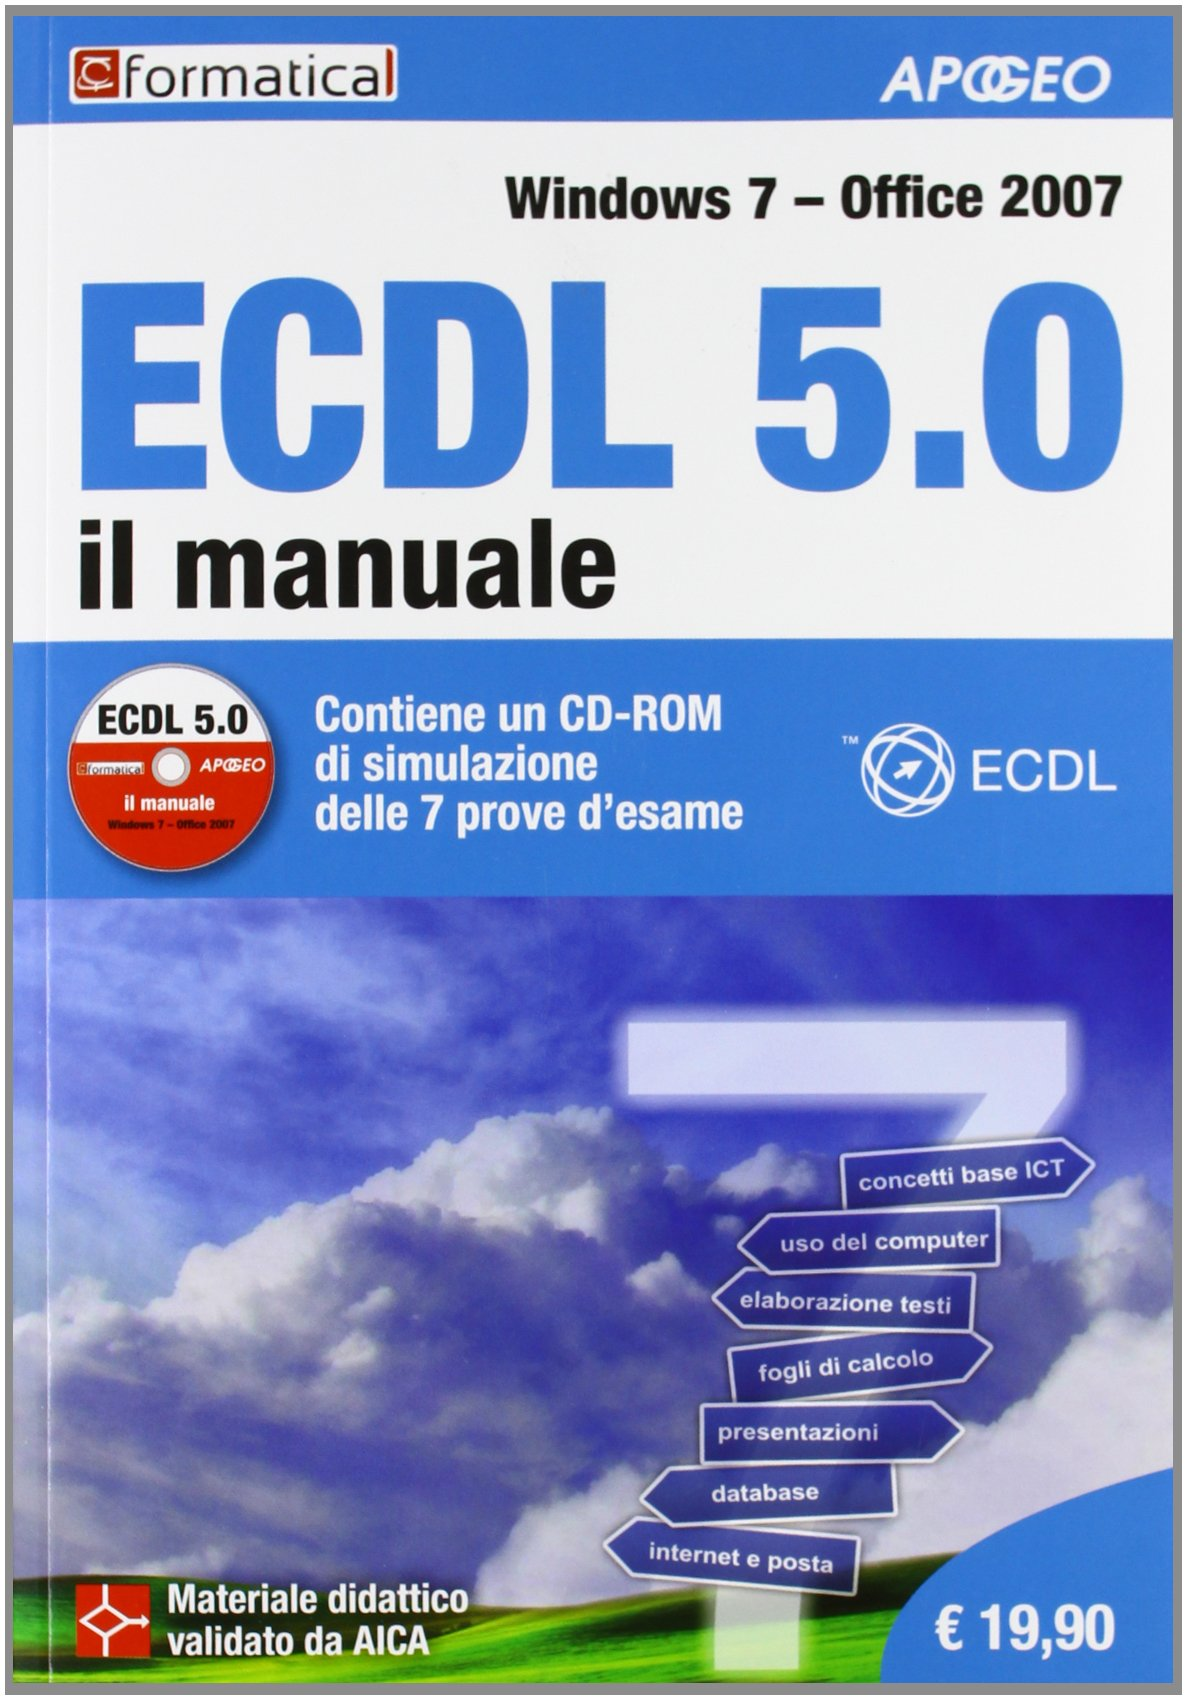 ECDL 5.0. Il manuale. Windows 7 Office 2007 Copertina flessibile – 19 set 2013 Formatica Apogeo Education 883878731X